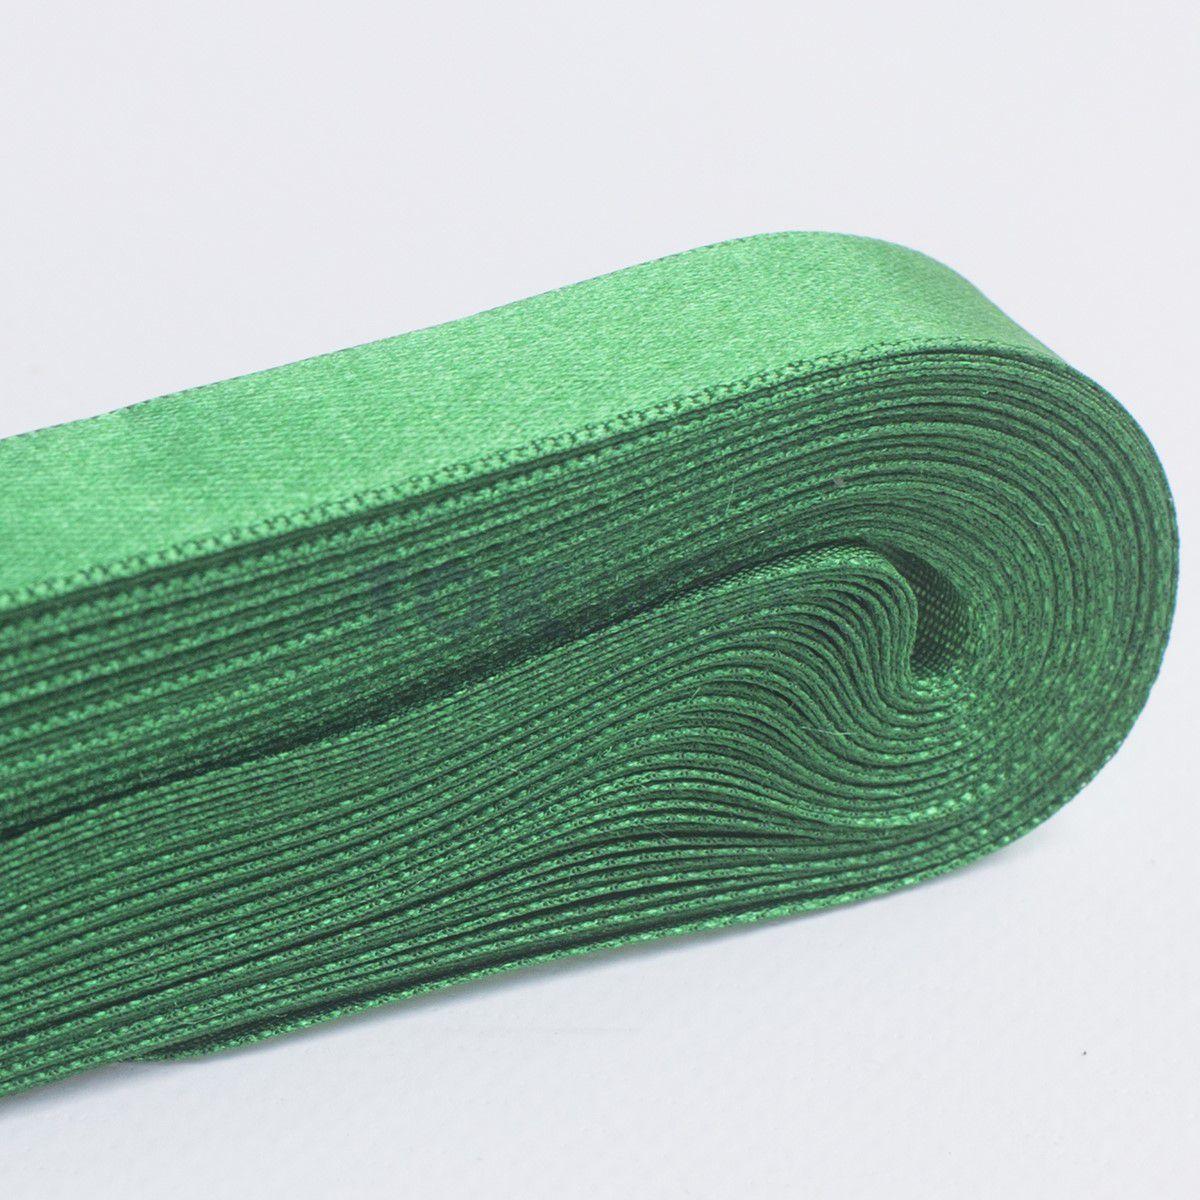 Fita Cetim N.5 - 22mm - 10 Metros - COR (23) Verde Bandeira